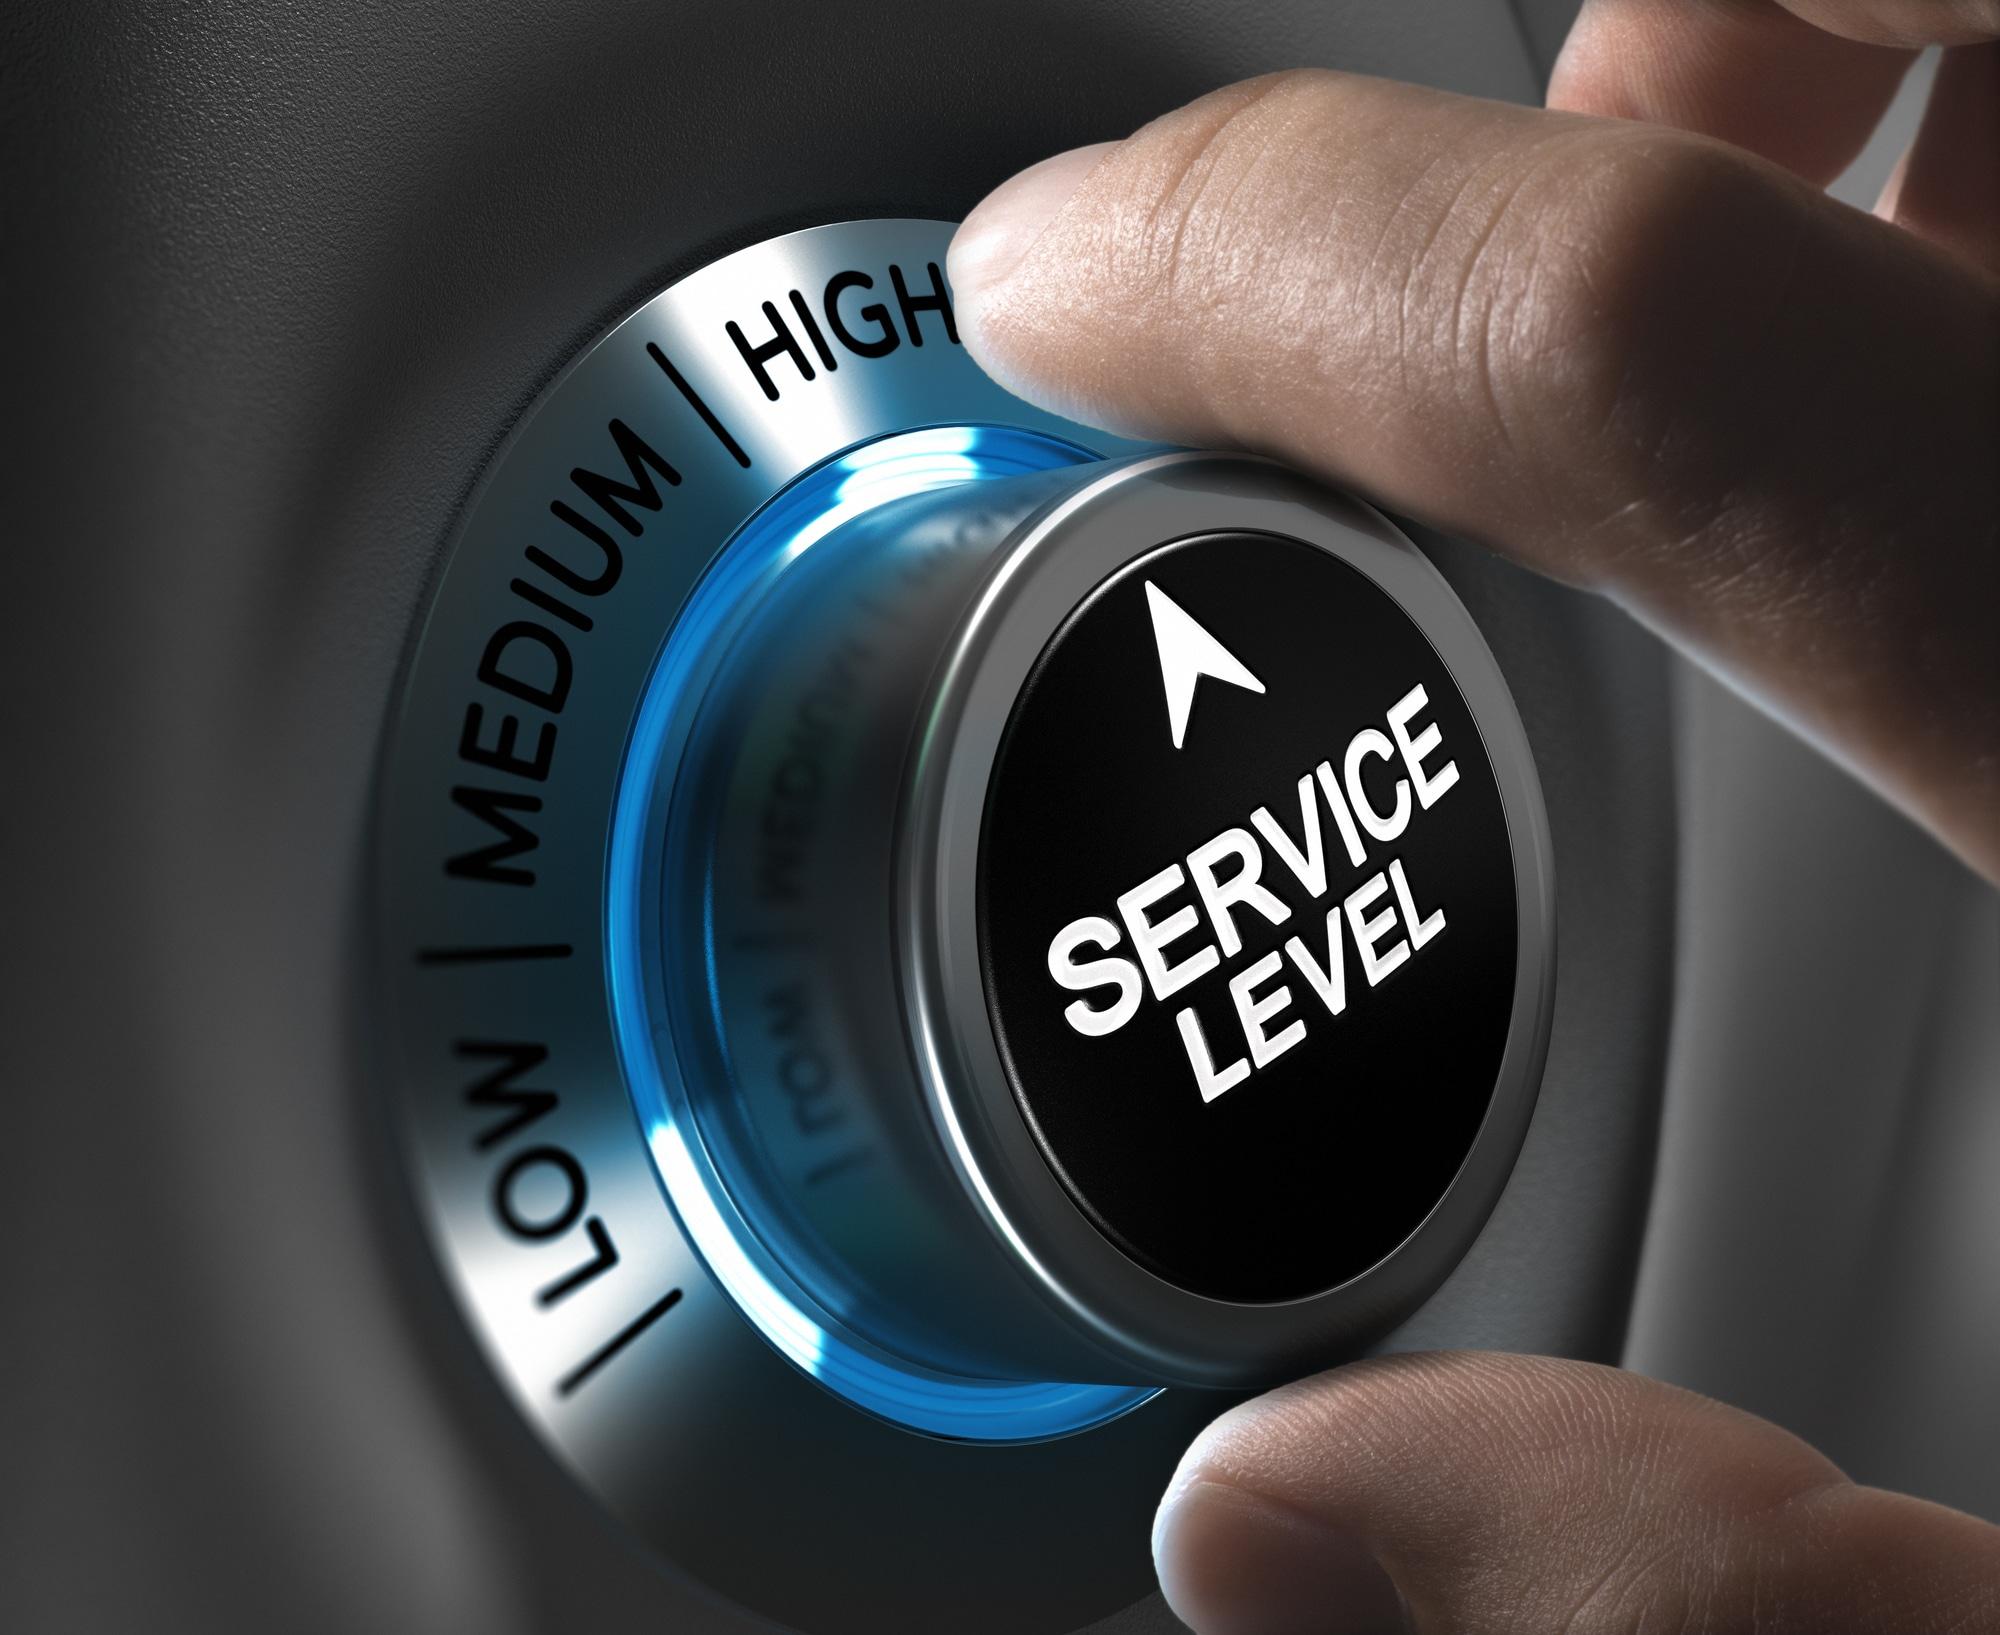 Customer Service Satisfaction Level High